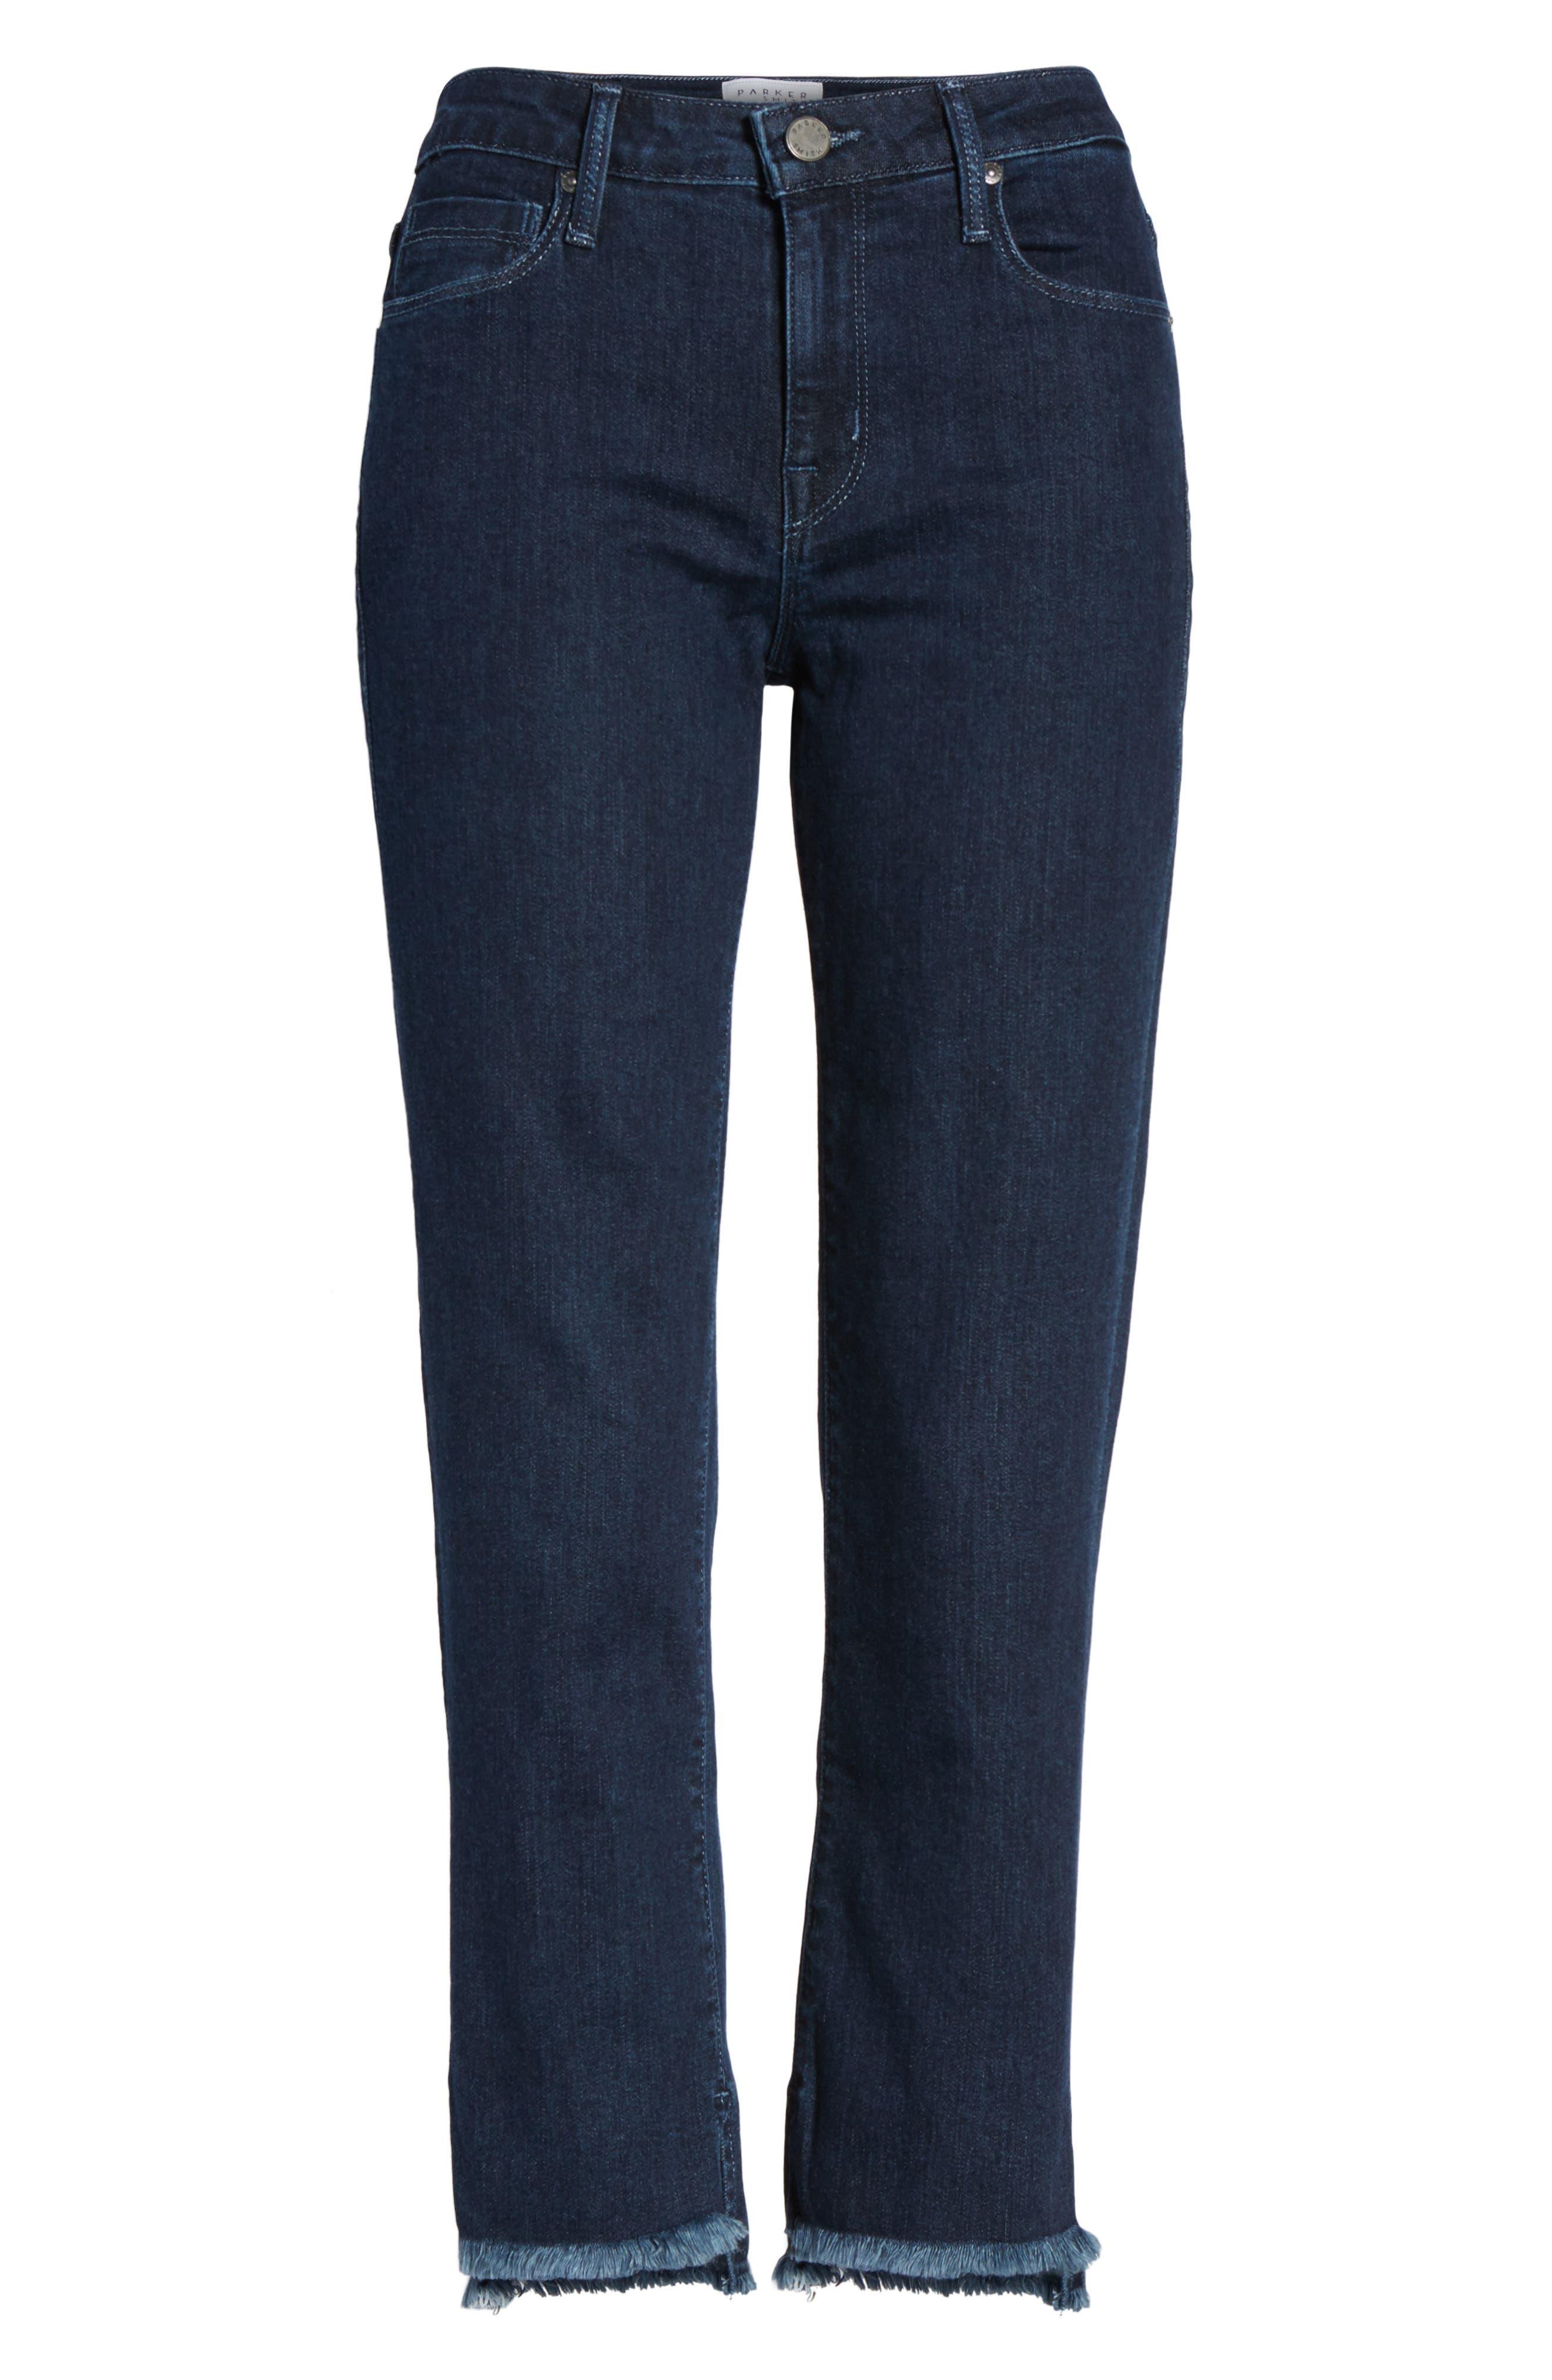 Step-Hem Straight Jeans,                             Alternate thumbnail 6, color,                             405